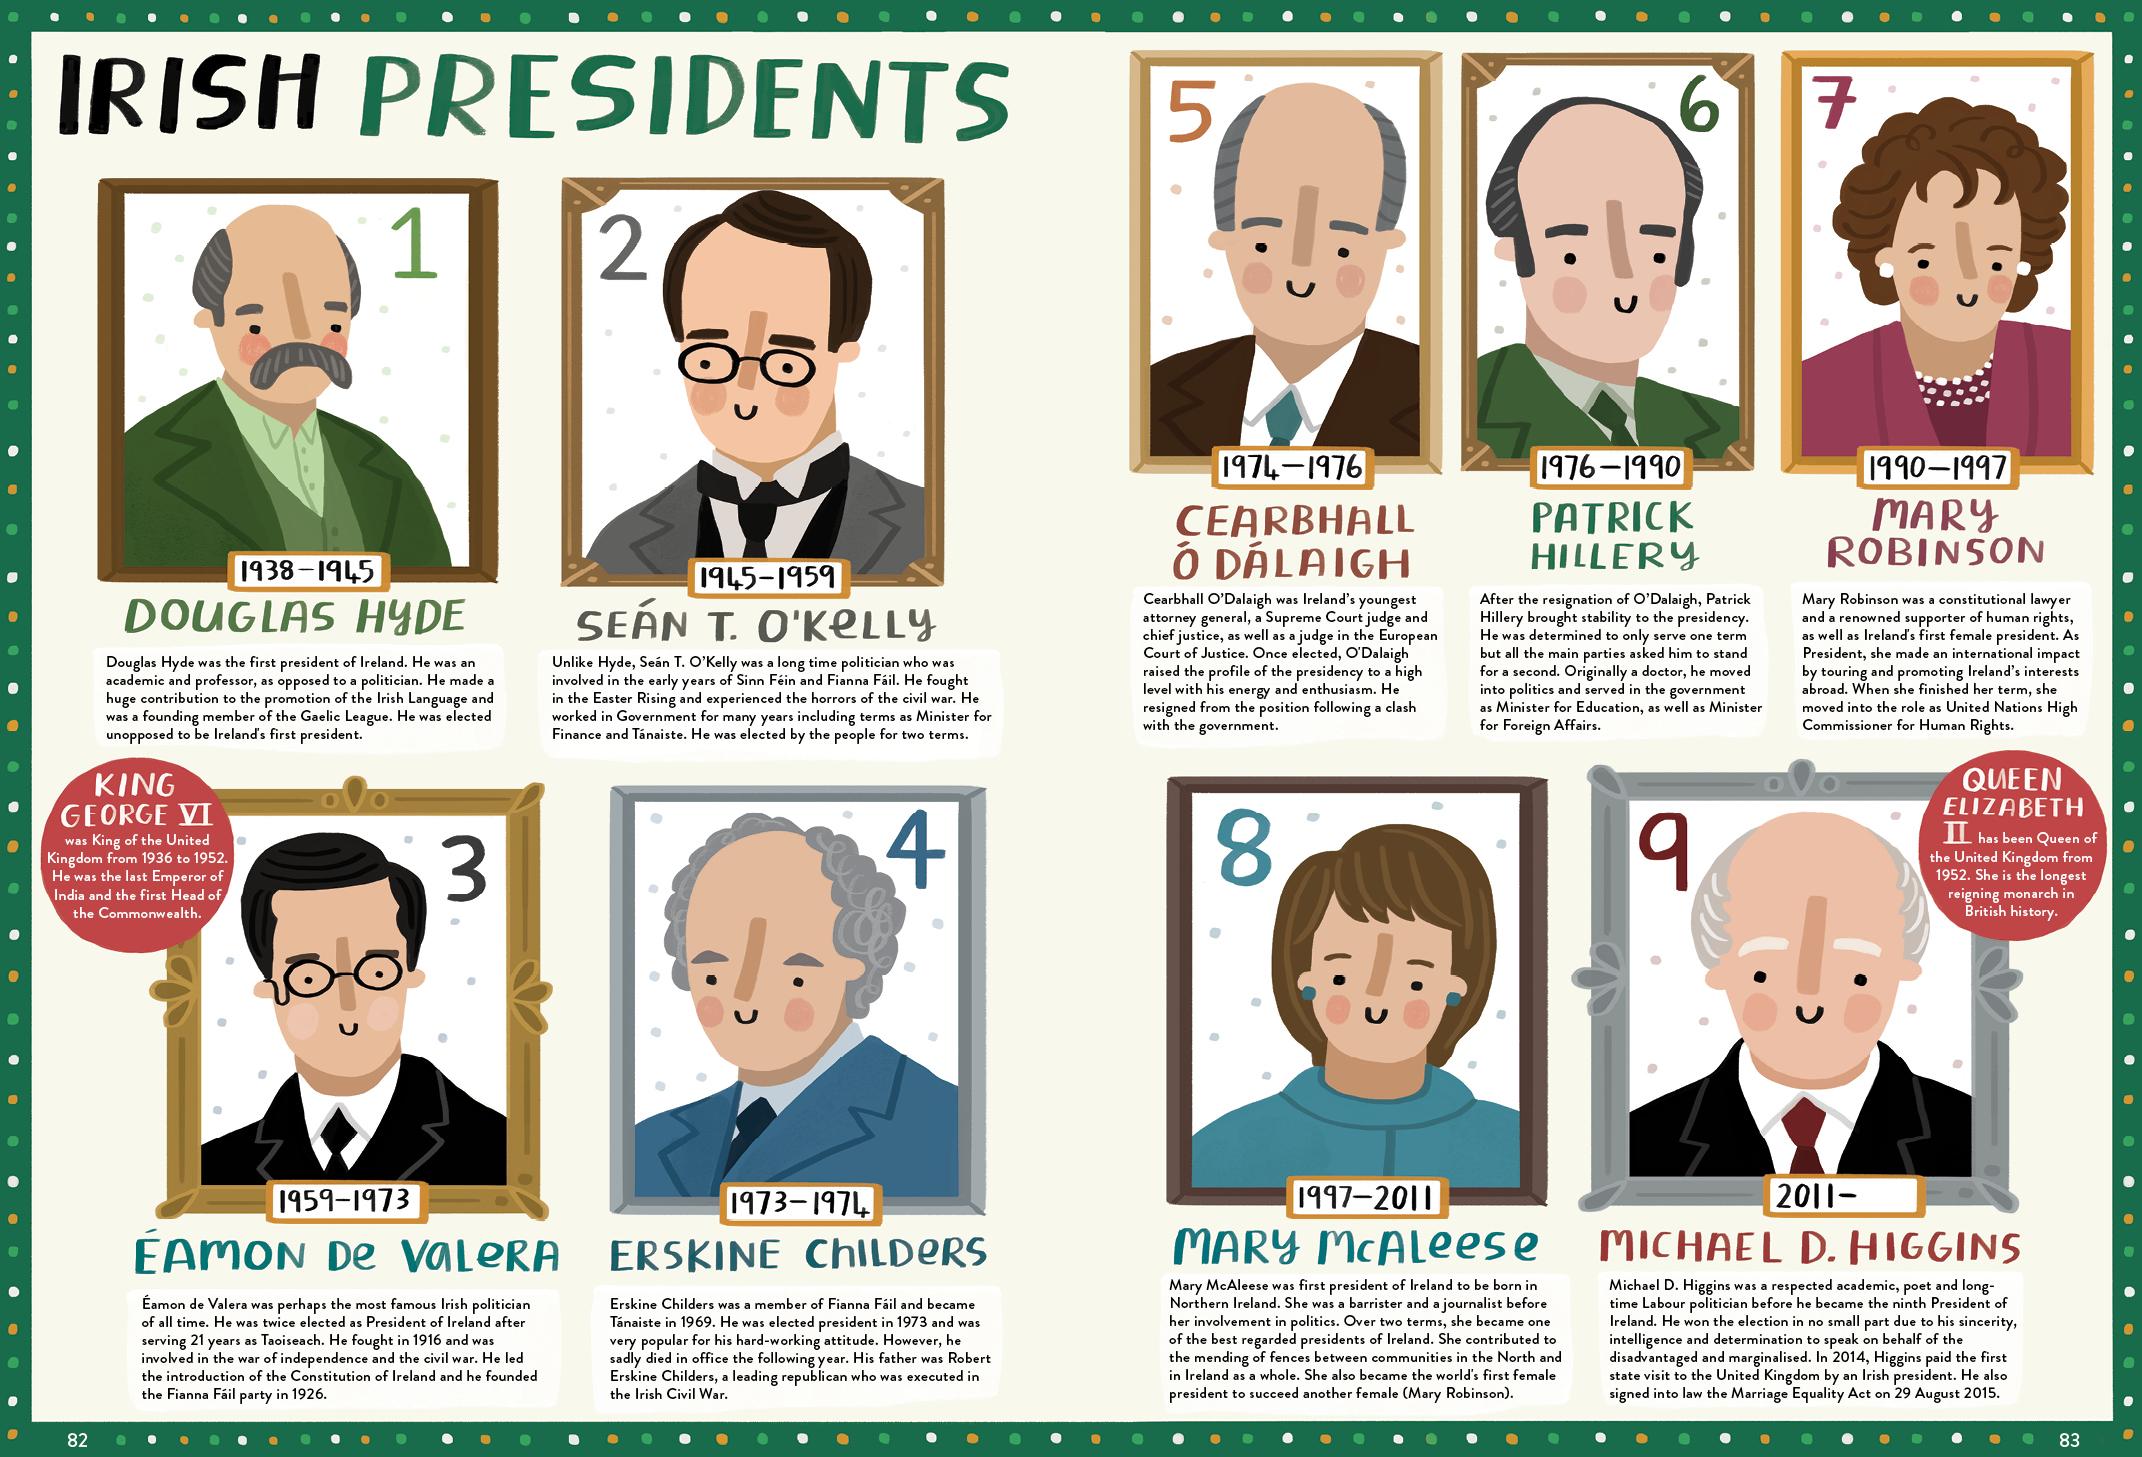 Irish Presidents p82&83.jpg